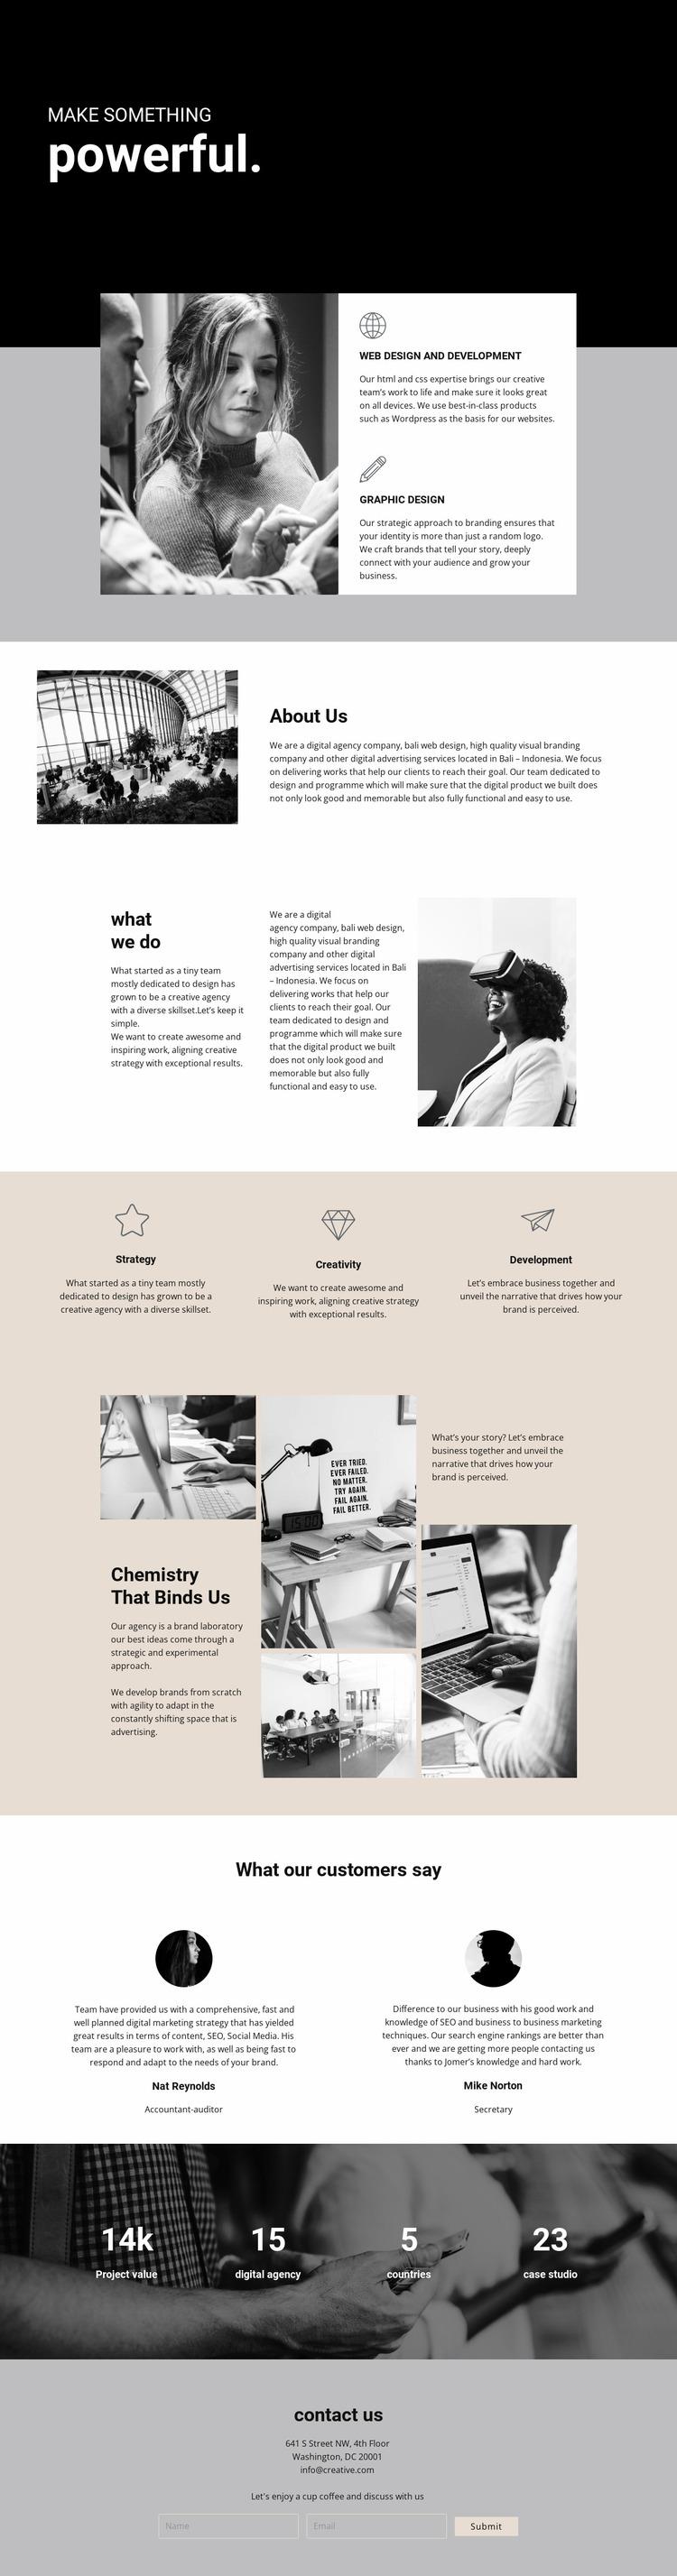 Power of digital business Website Mockup